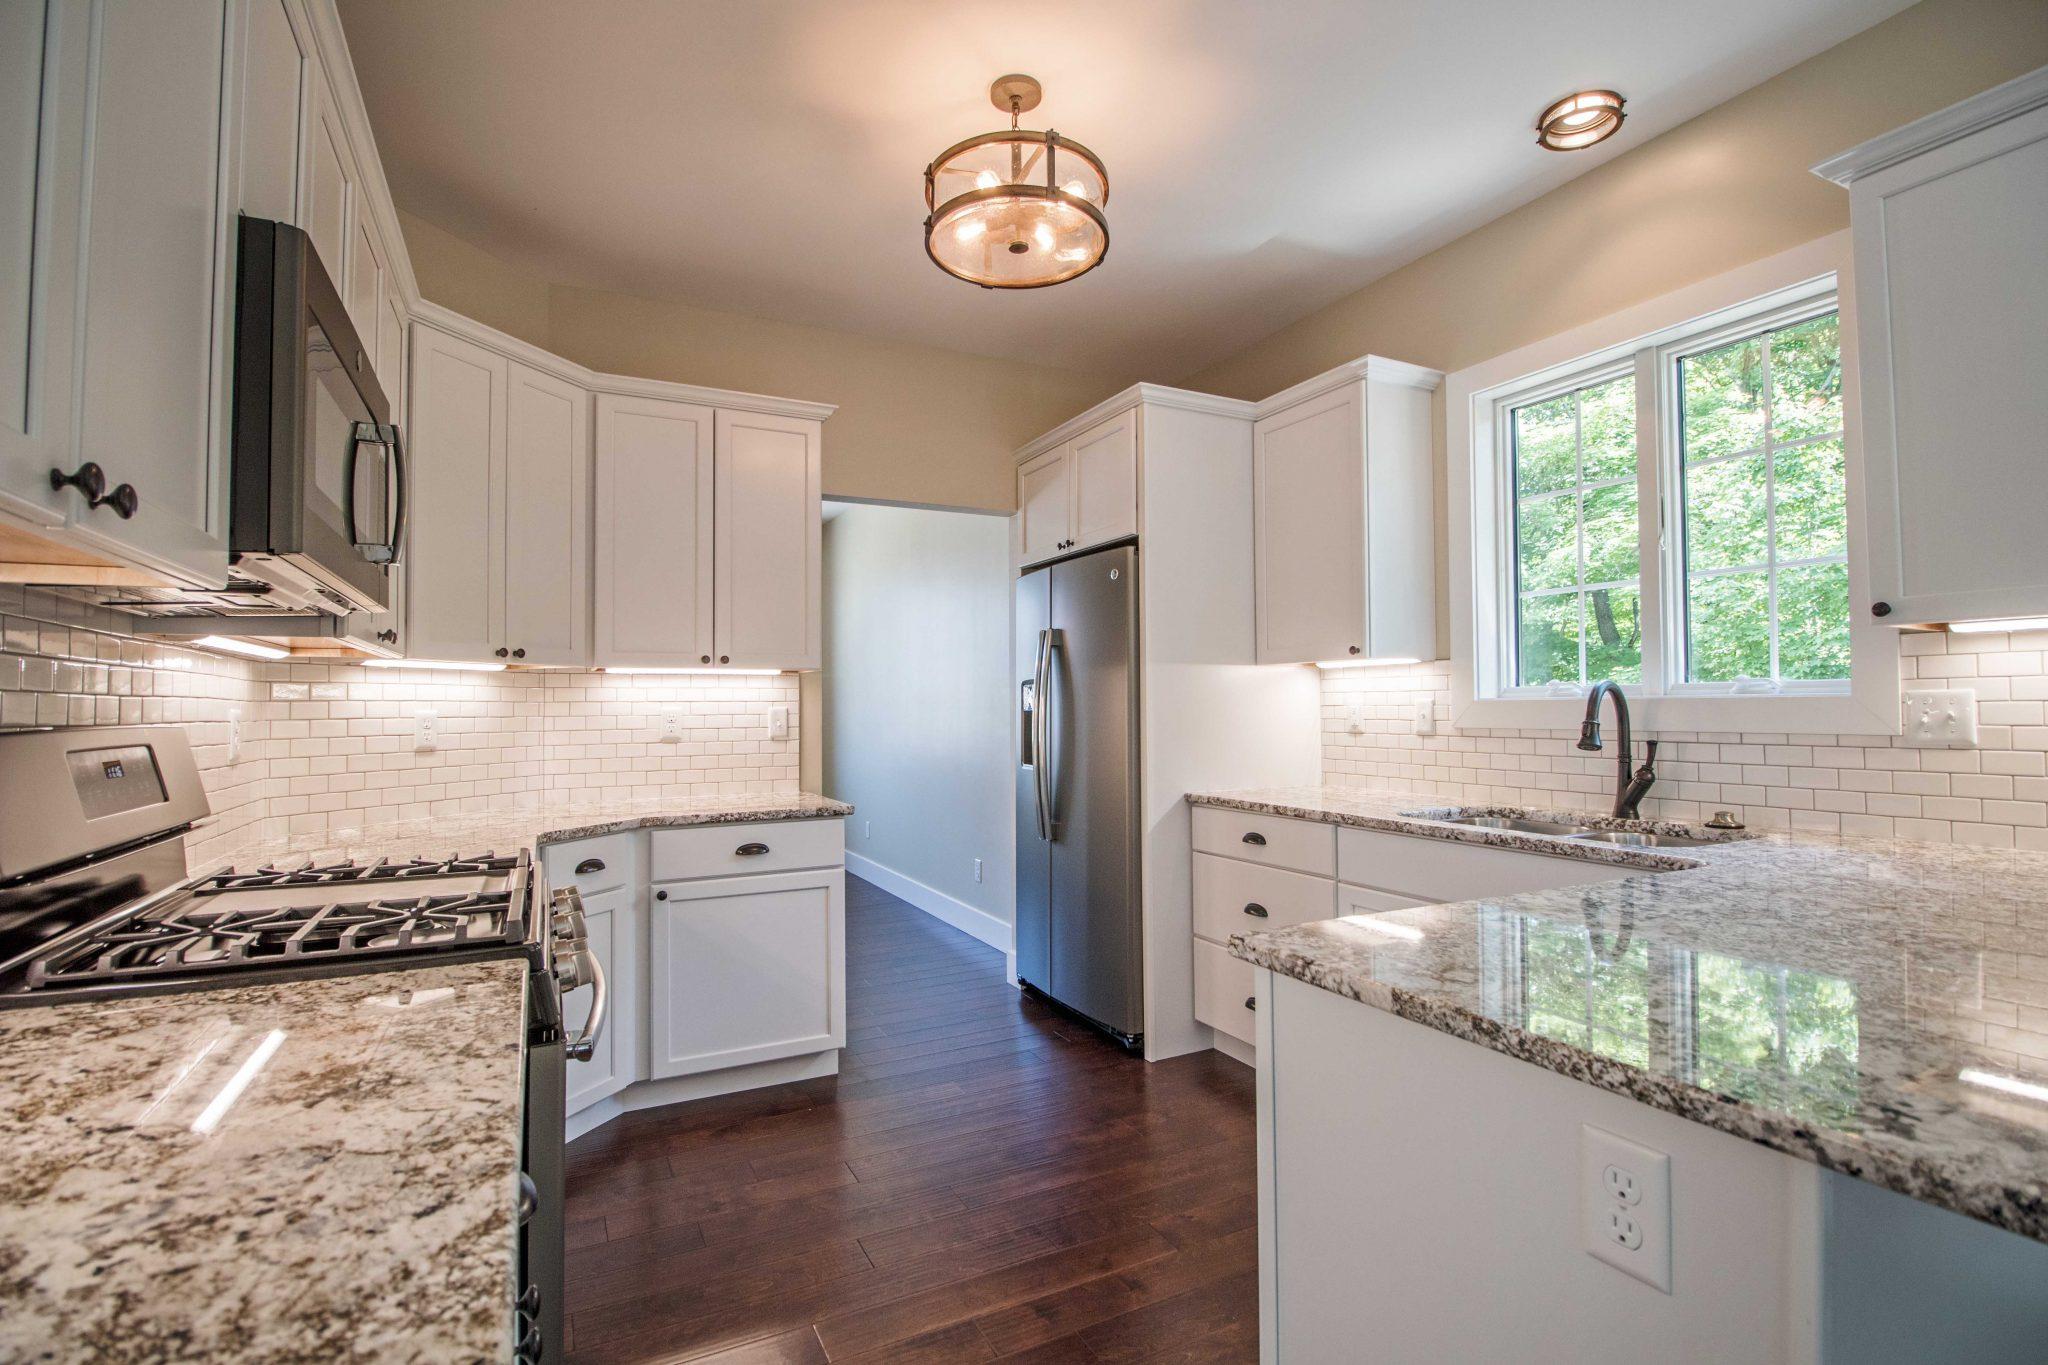 new nice bright kitchen